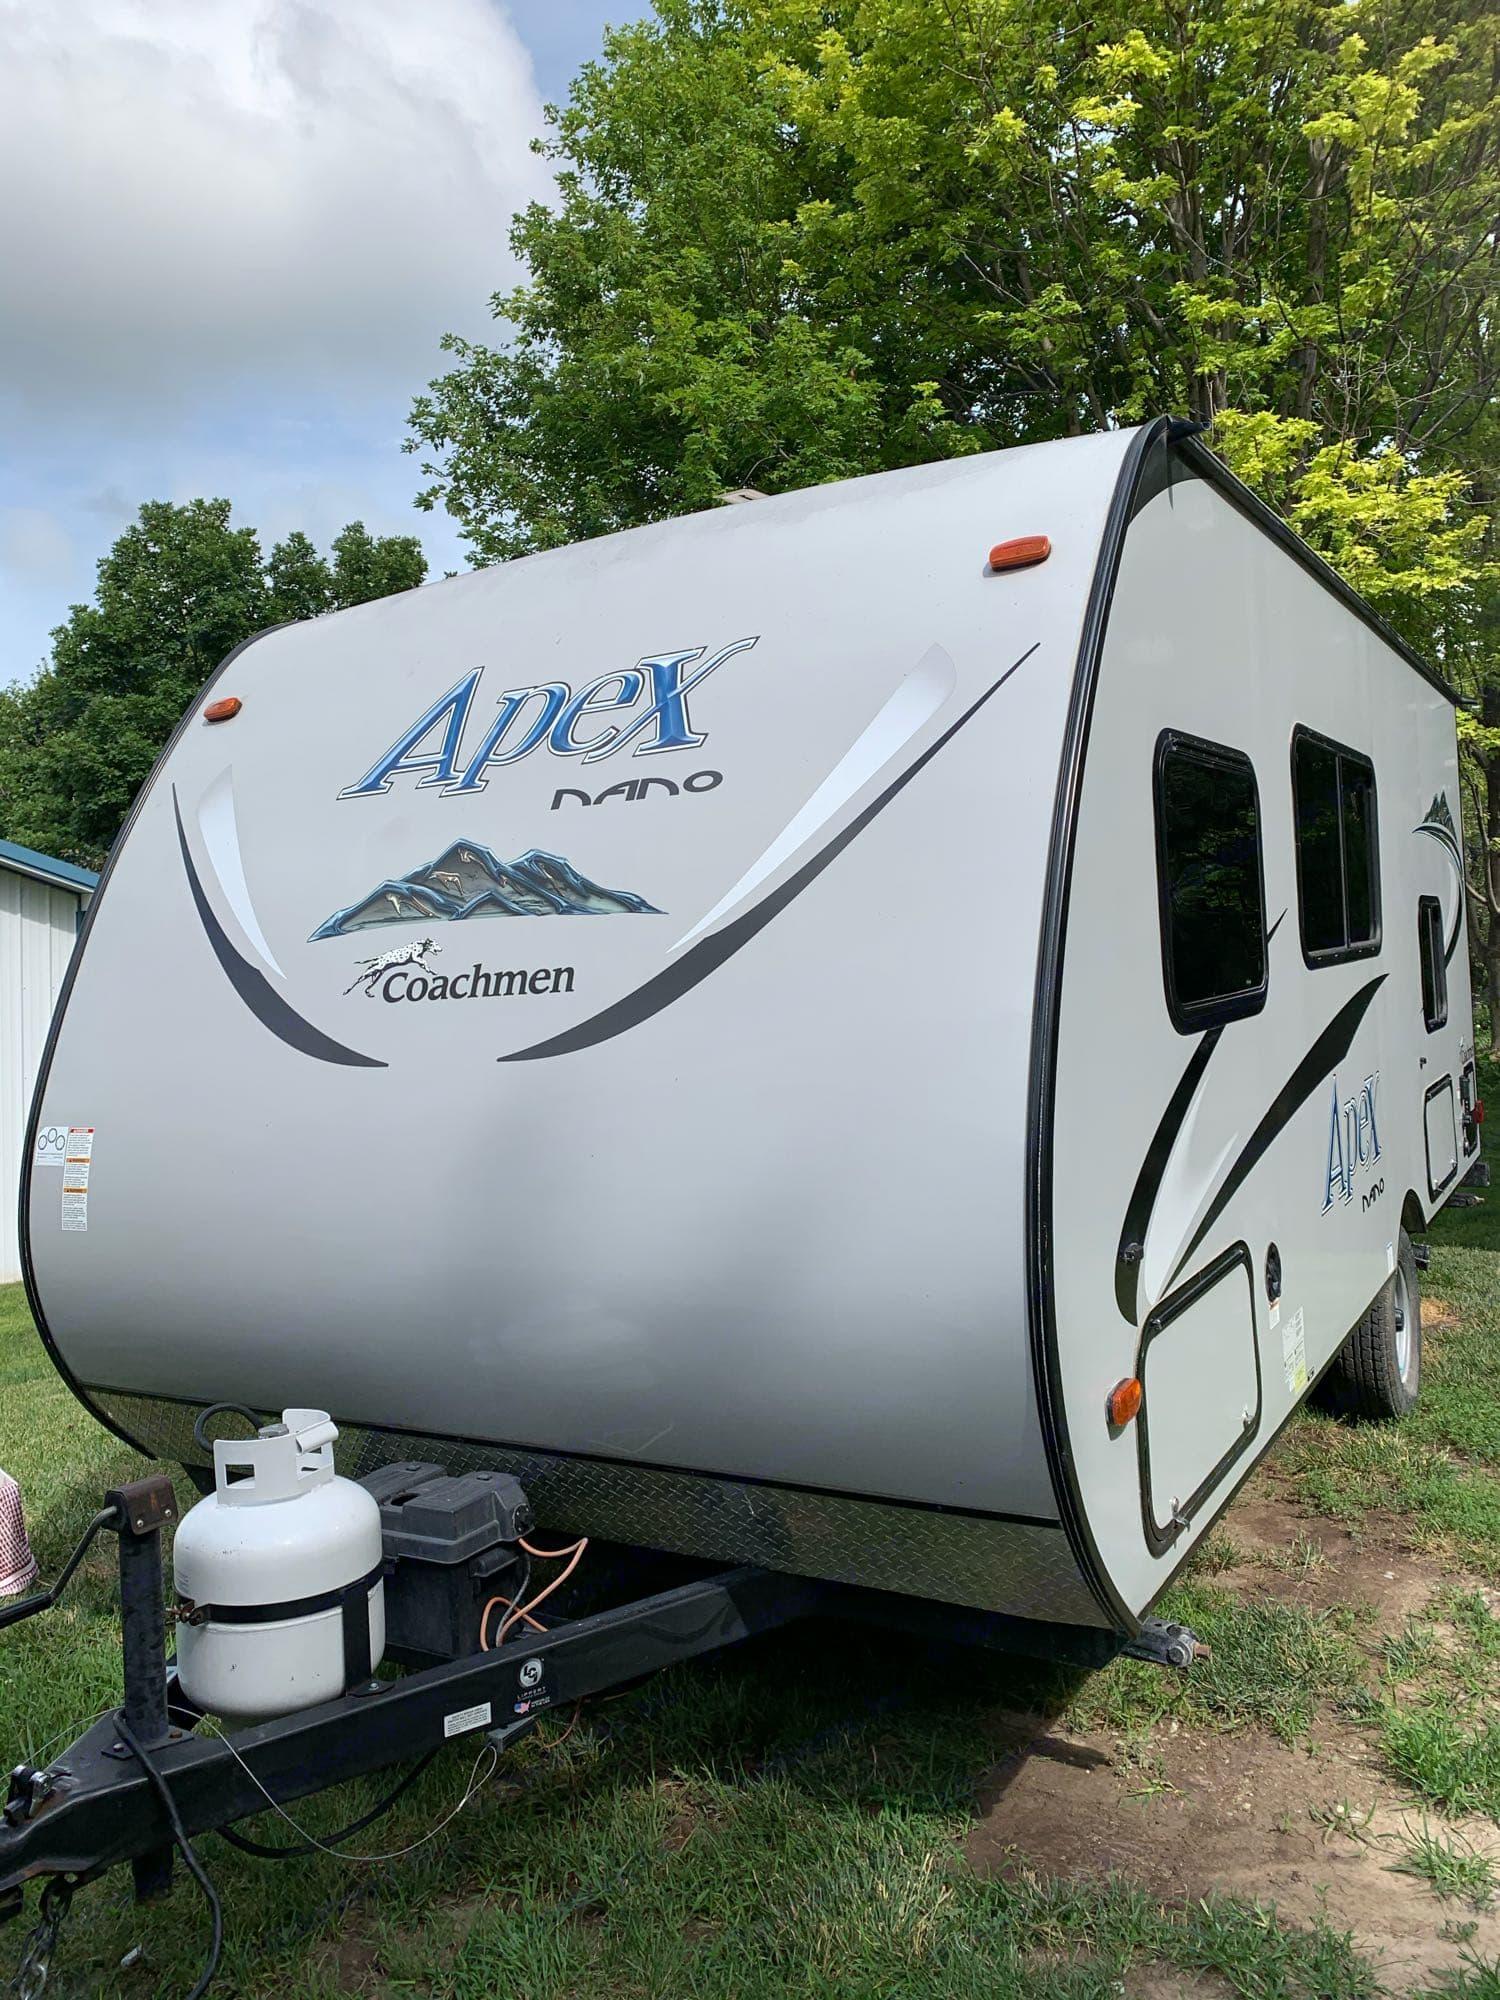 Apex Nano by Coachman BH 185 20 ft Camping Trailer. Coachmen Apex 2016